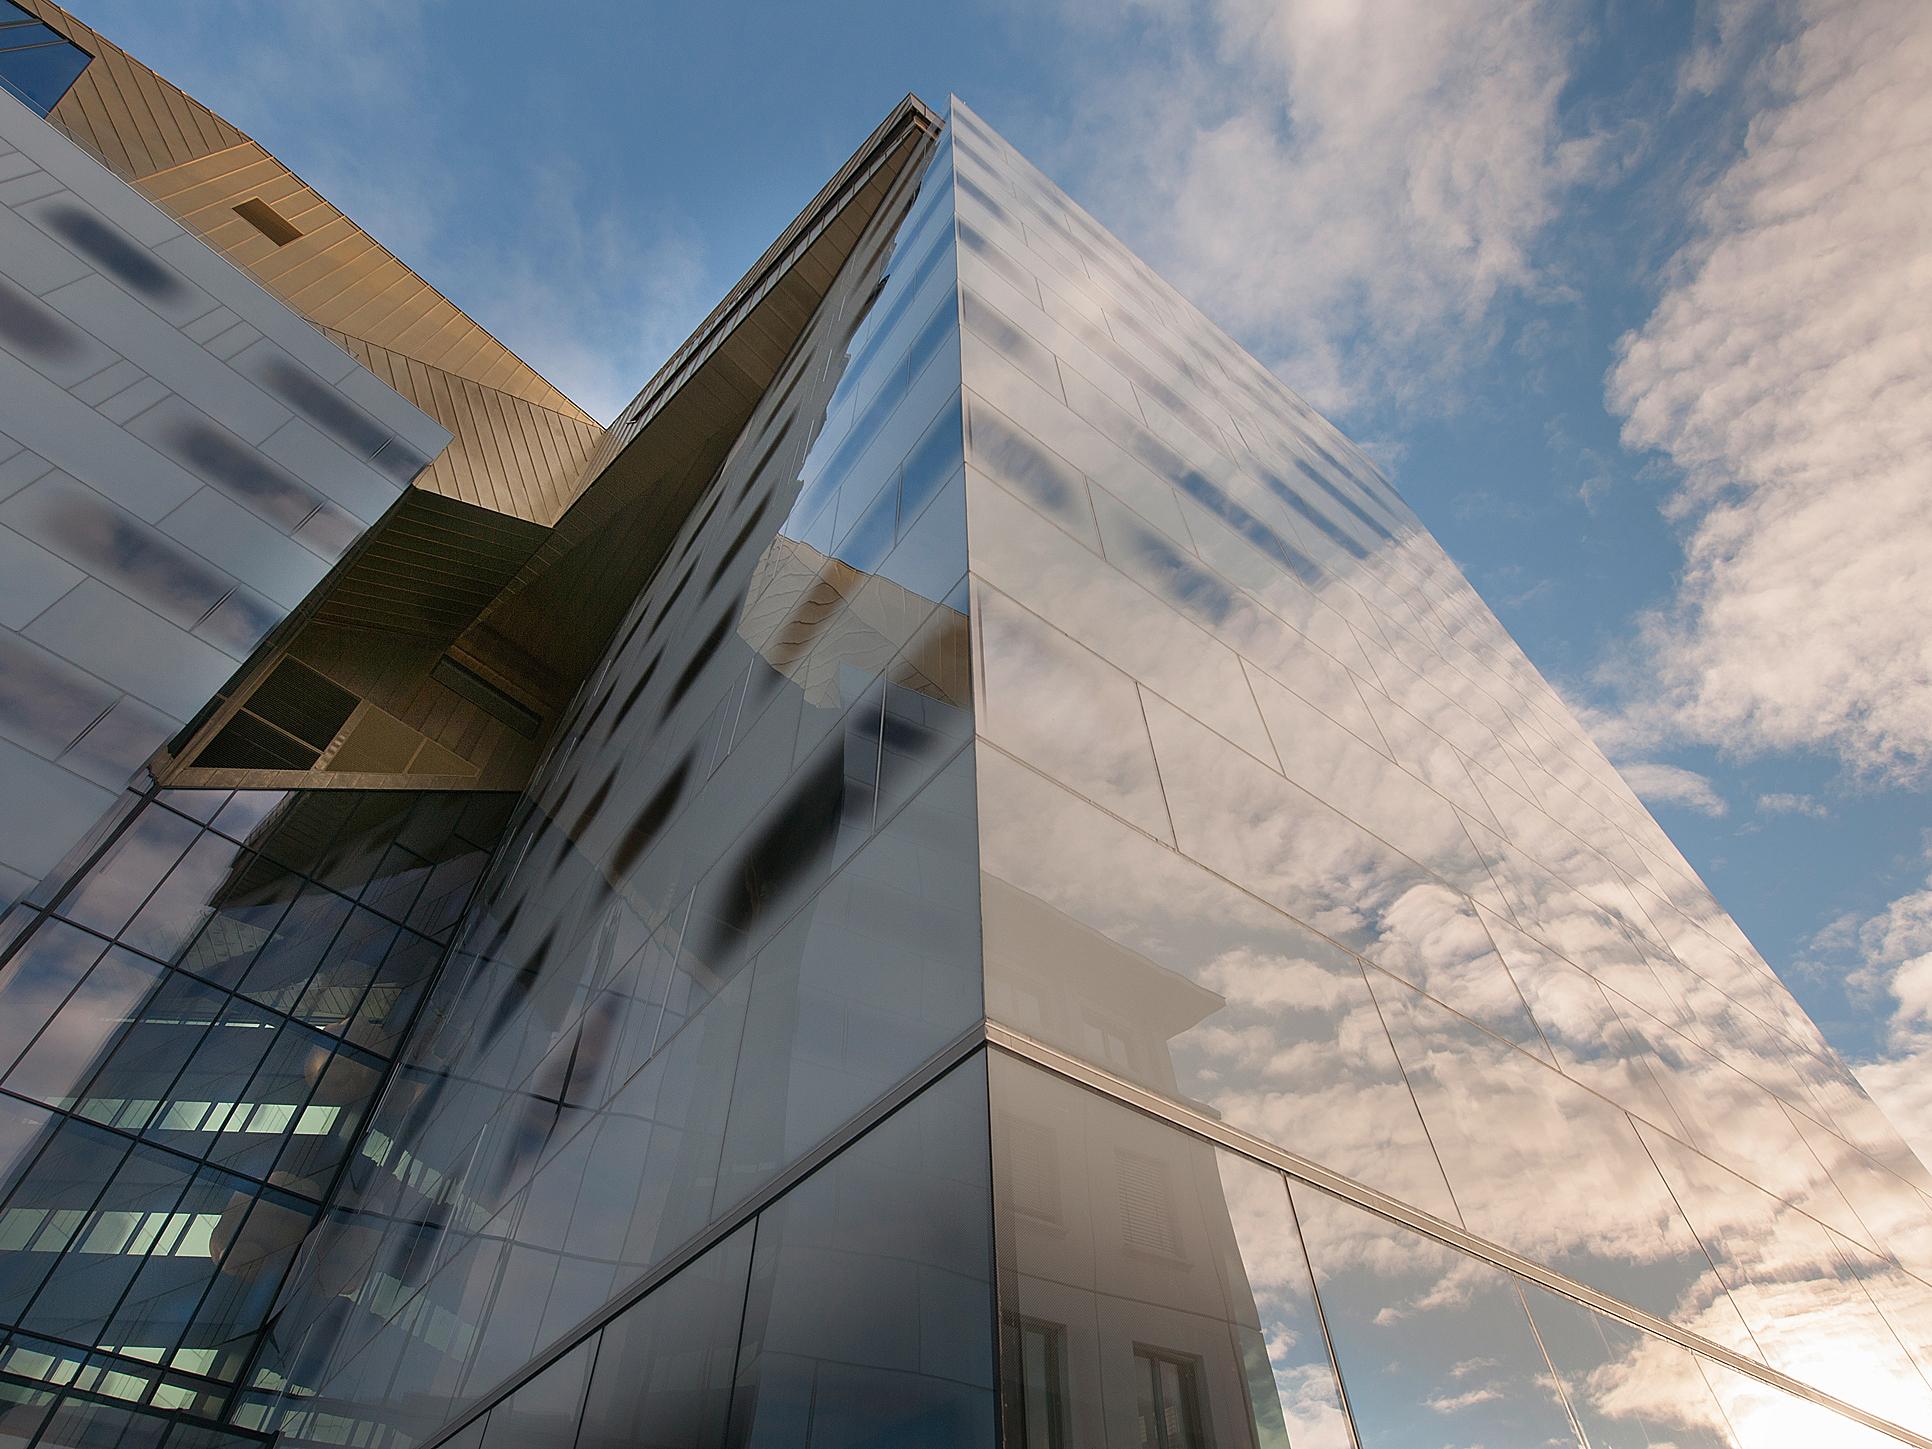 Clarion Trondheim Architecture Fotografie